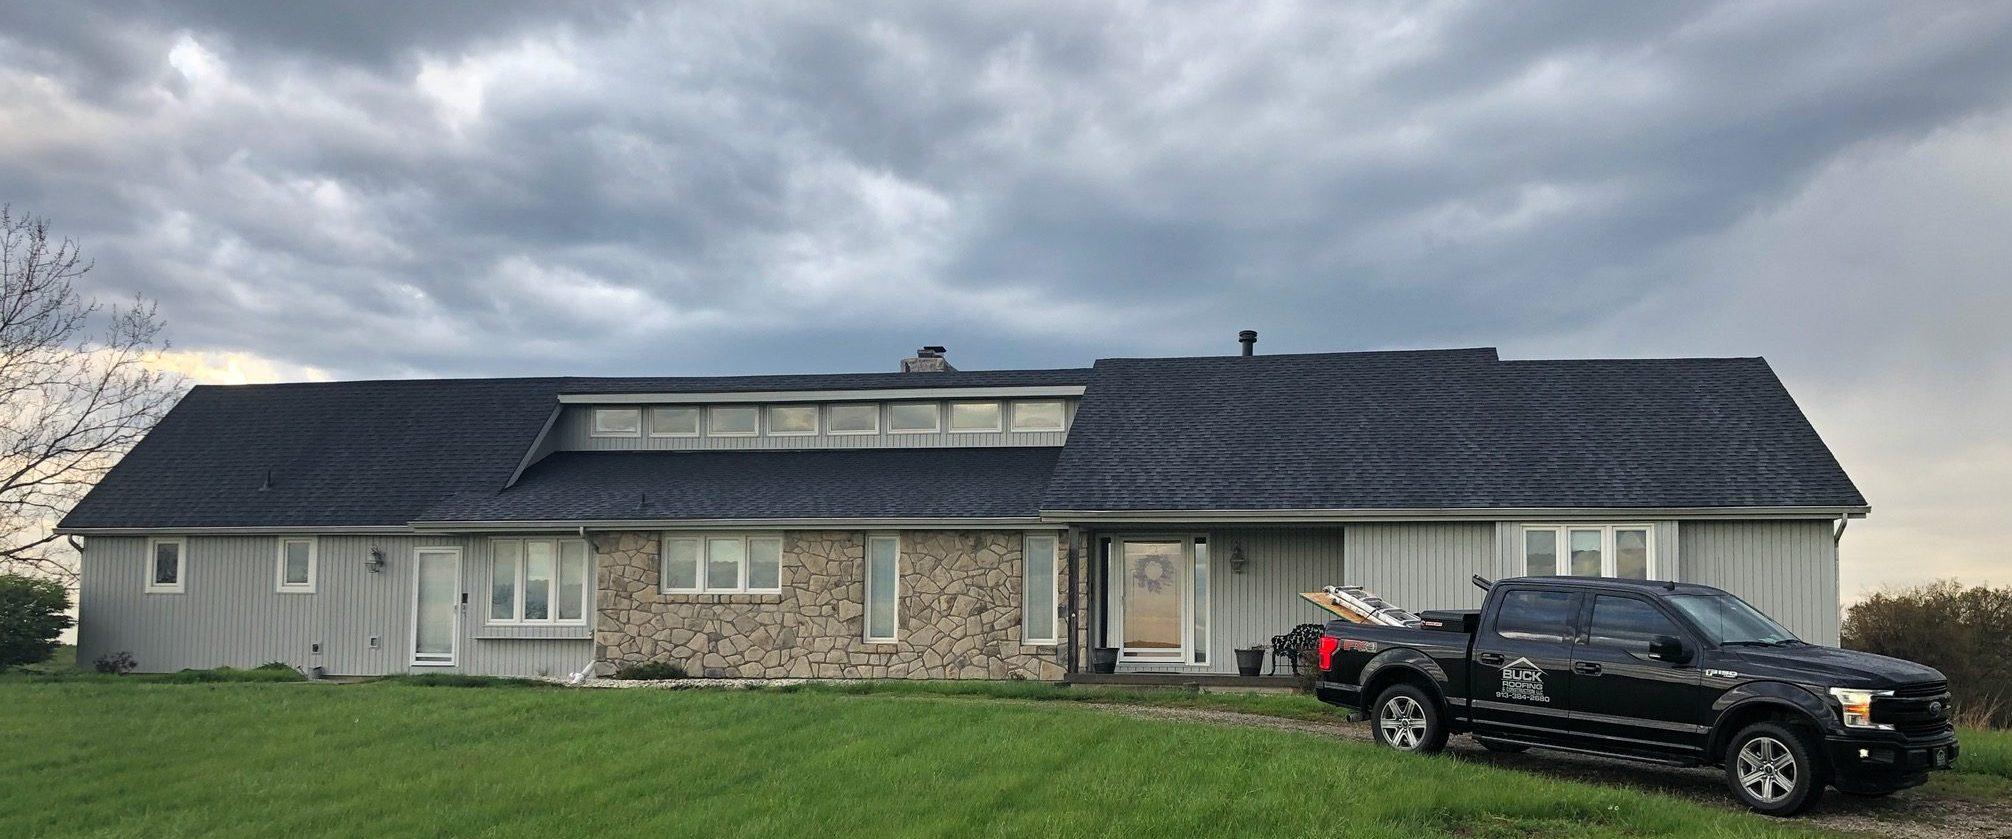 Buck Roofing - Residential Roofing - Kansas and Missouri - Certainteed Landmark - Moire Black - Certainteed Shadow Ridge